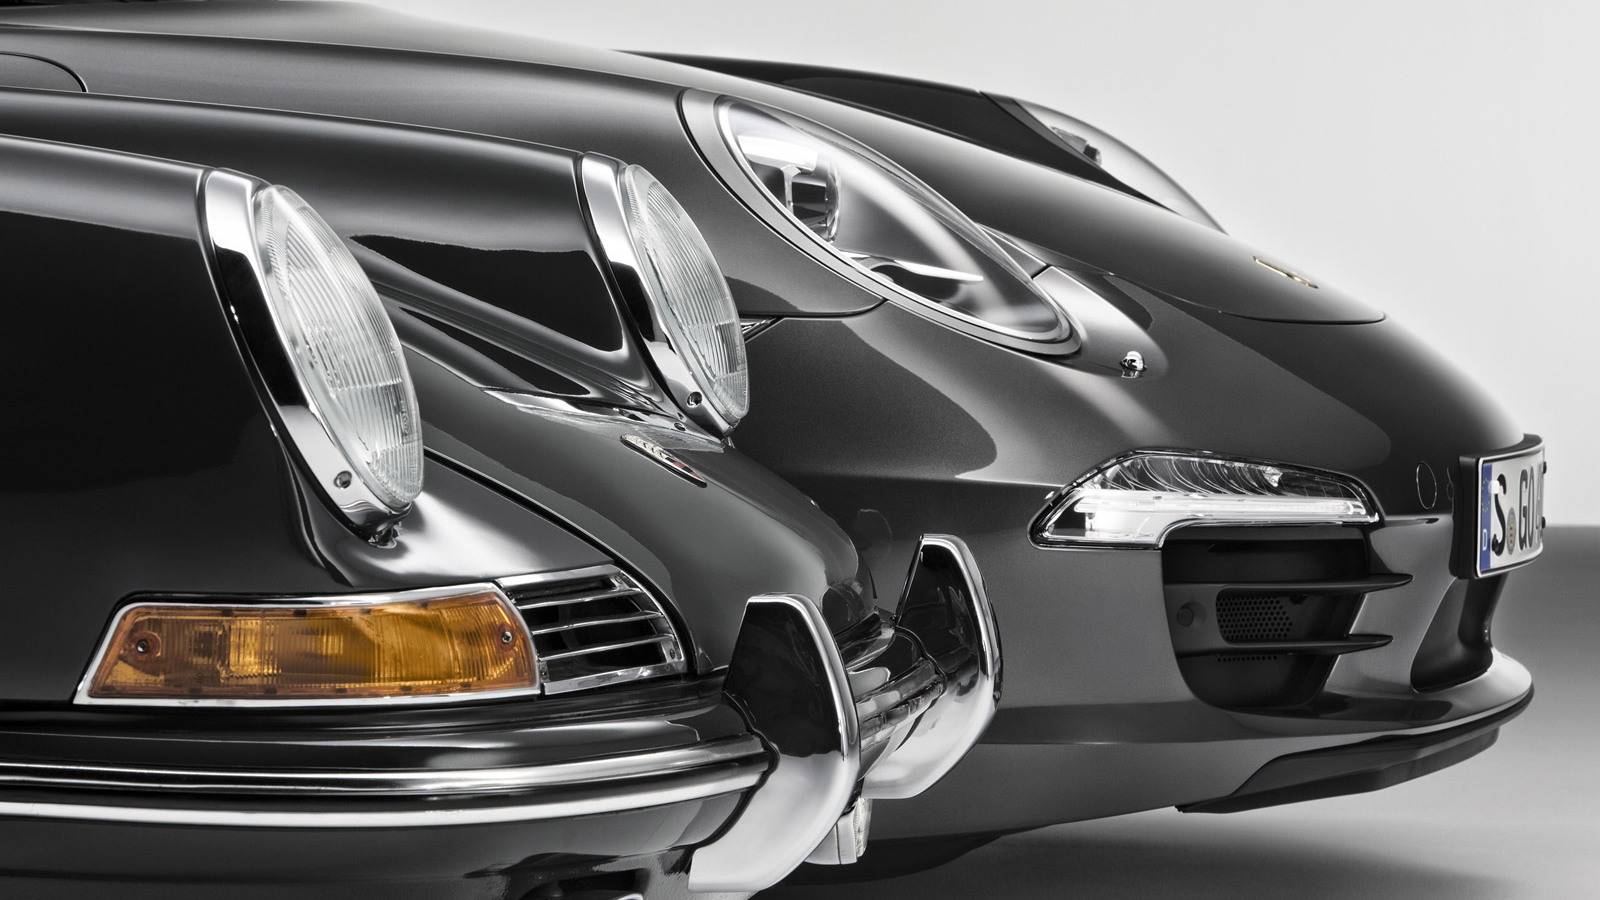 Original 1964 Porsche 911 and the Type-991 2013 Porsche 911 Carrera 4S